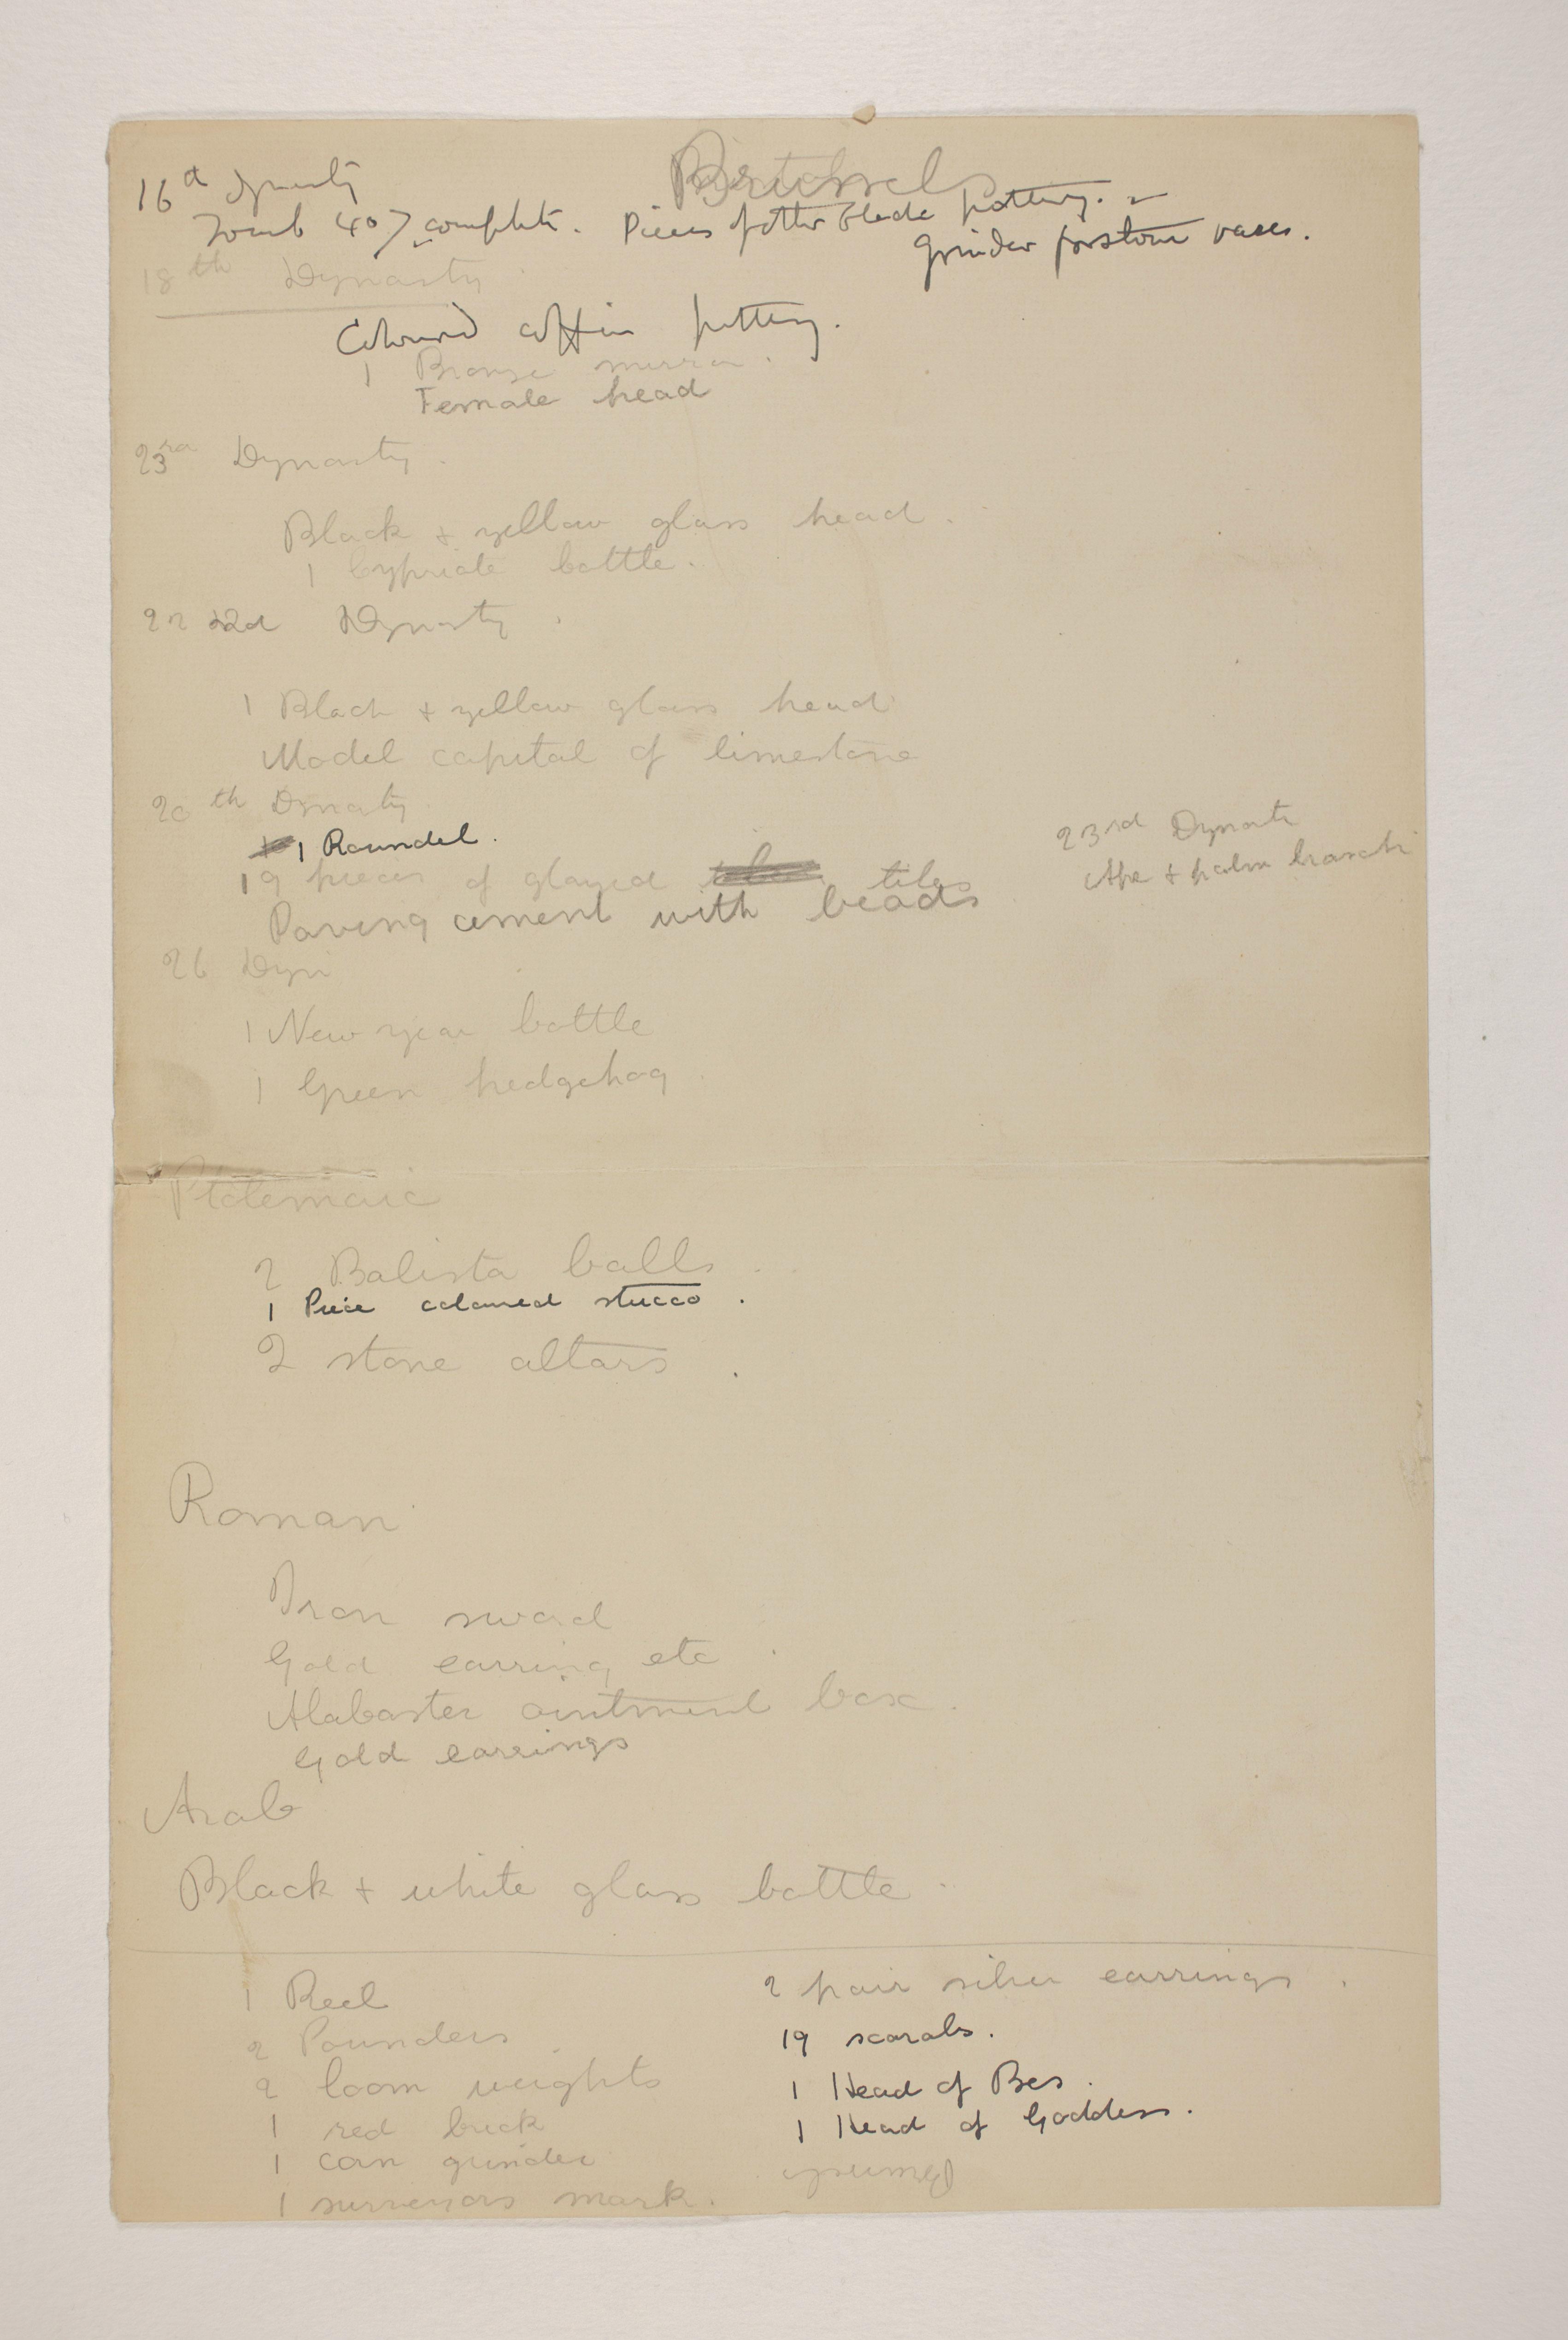 1905-06 Eastern Delta: Belbeis, Tell el-Rataba, Saft el-Hinna, Tell el-Yahudiya, Shaghanbeh, Ghita Individual institution list  PMA/WFP1/D/14/6